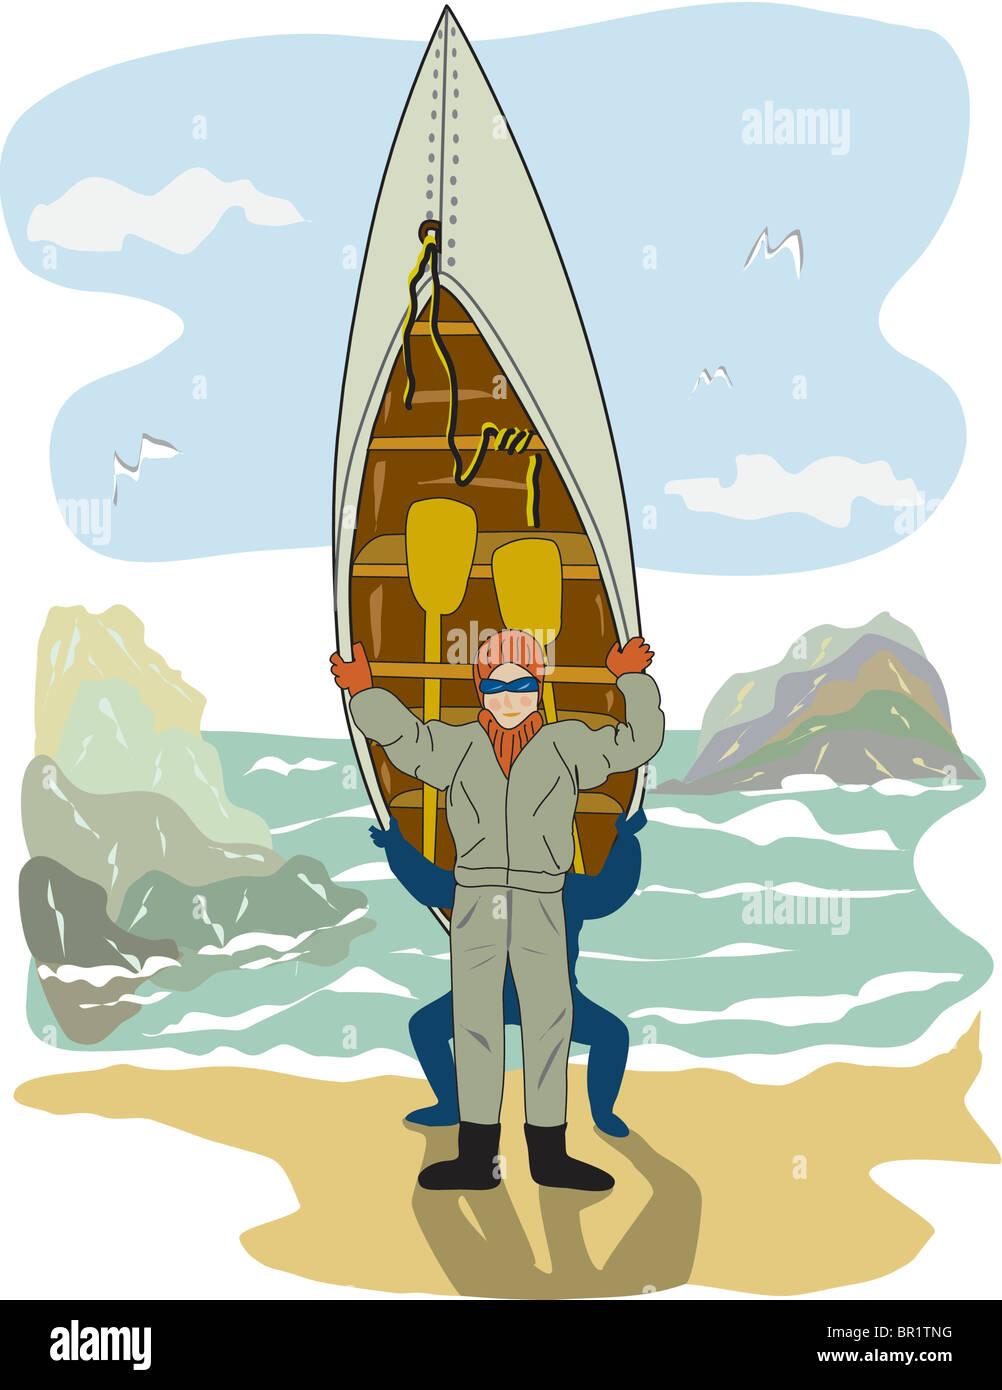 A ma portaging by the seashore Stock Photo